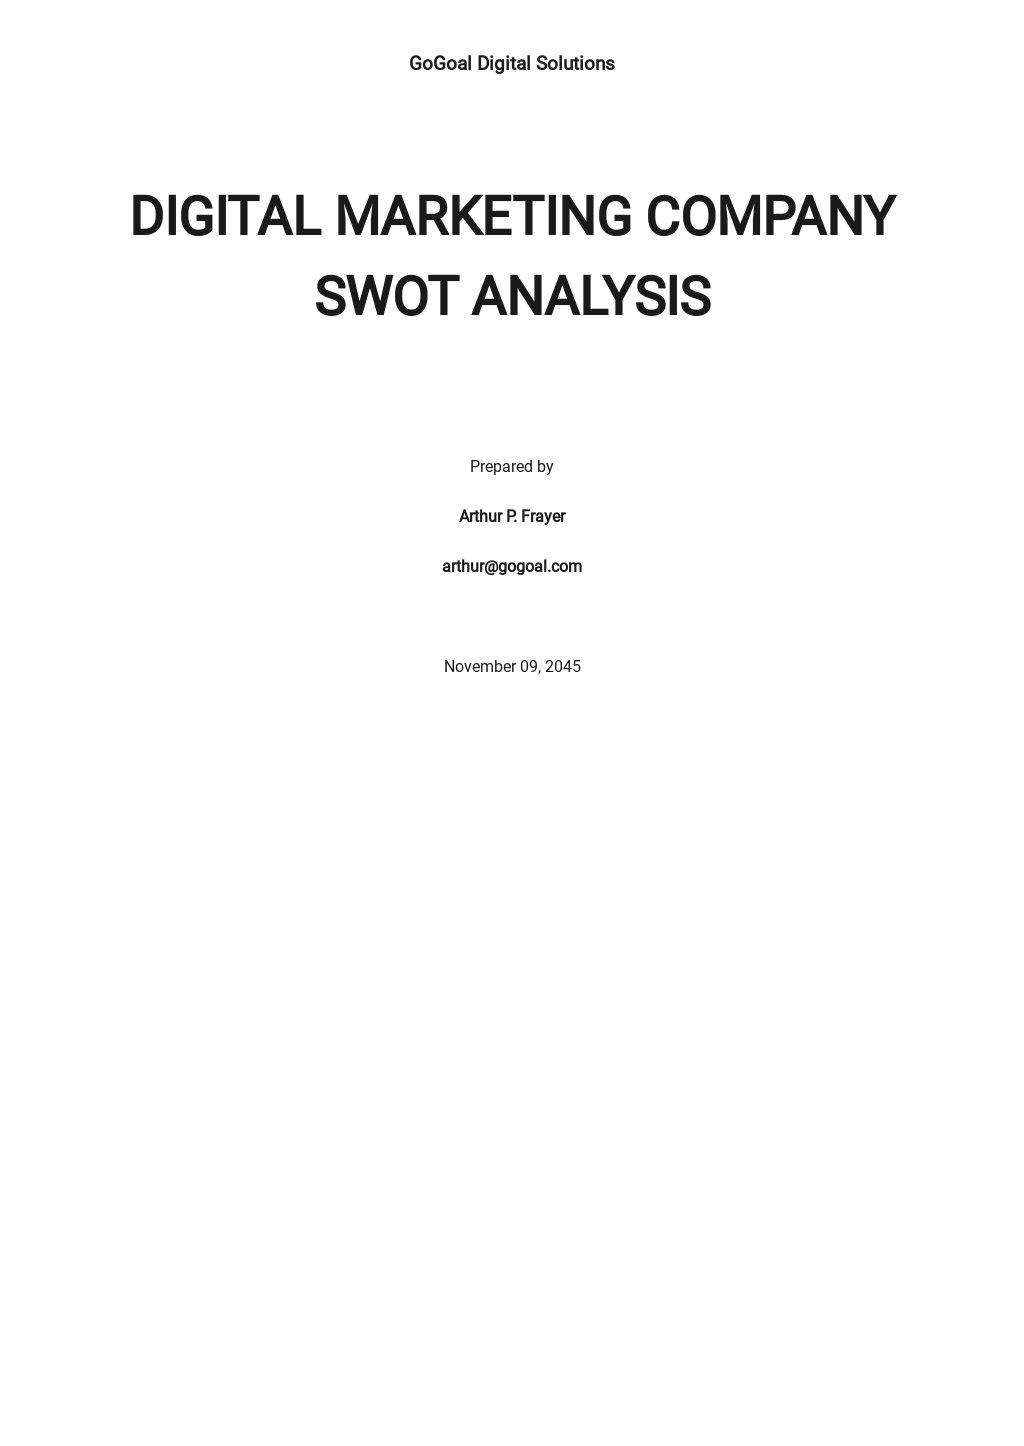 Blank SWOT Analysis Template.jpe